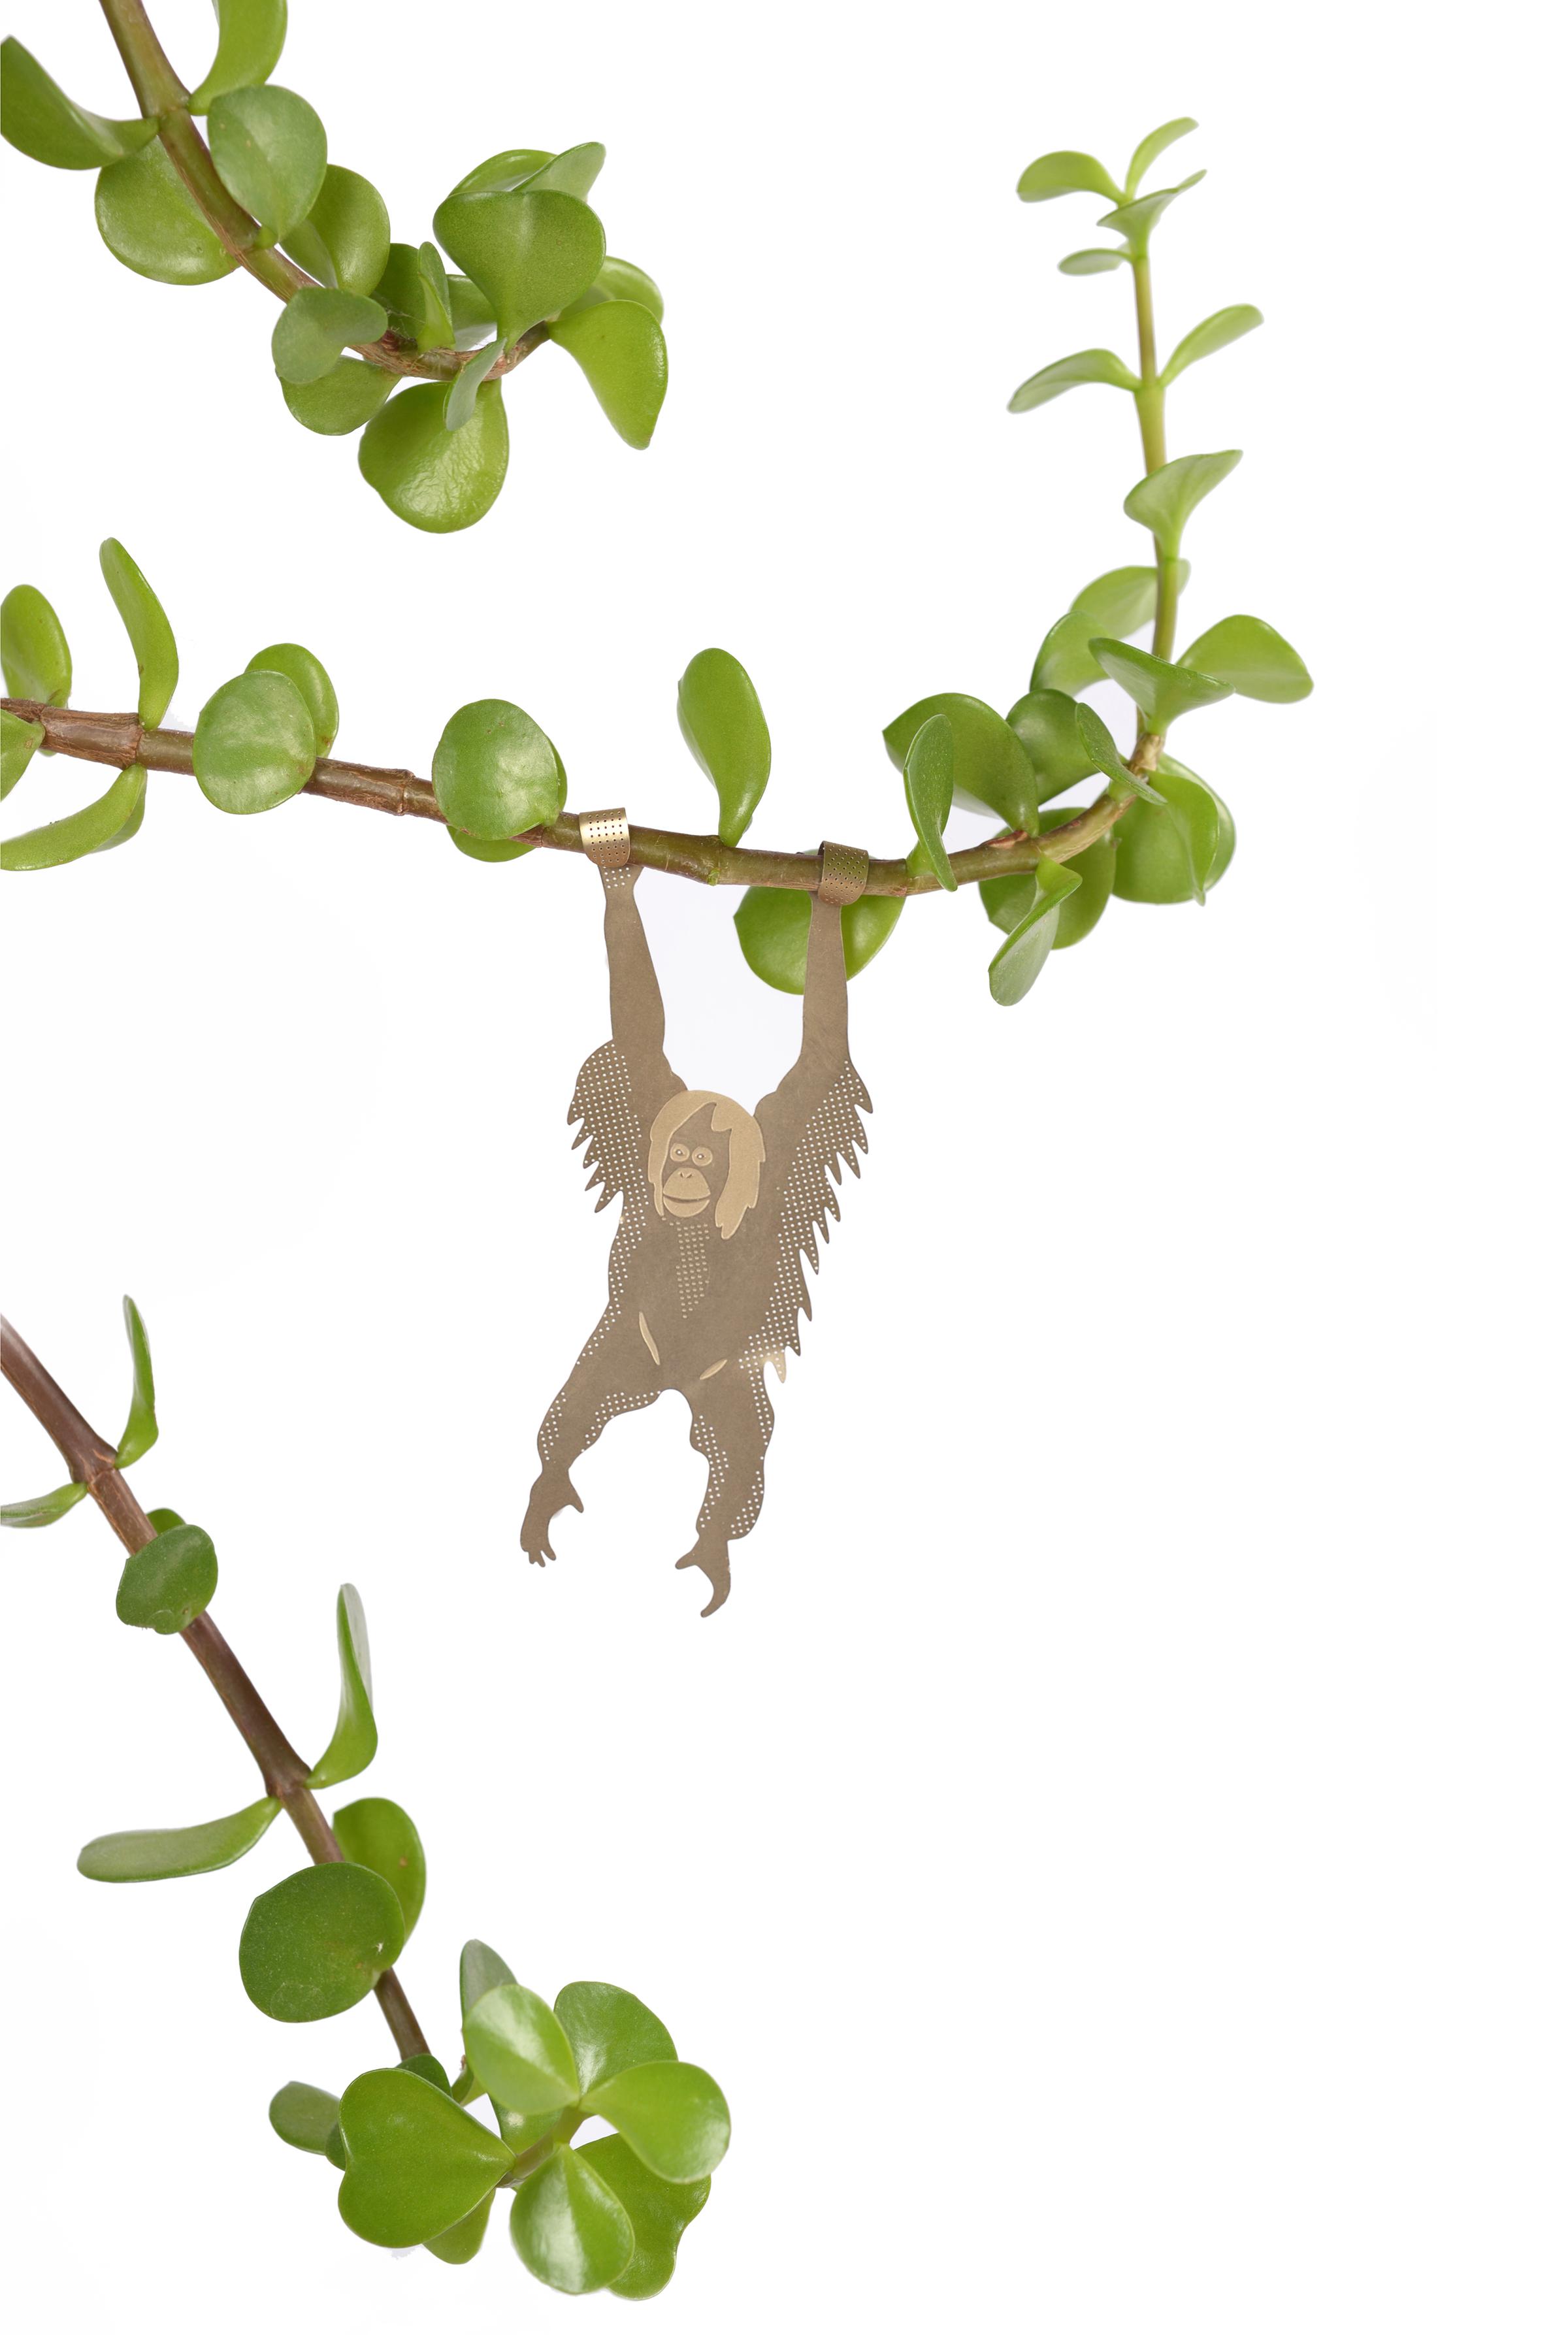 orangutan-white-green-plants-.jpg